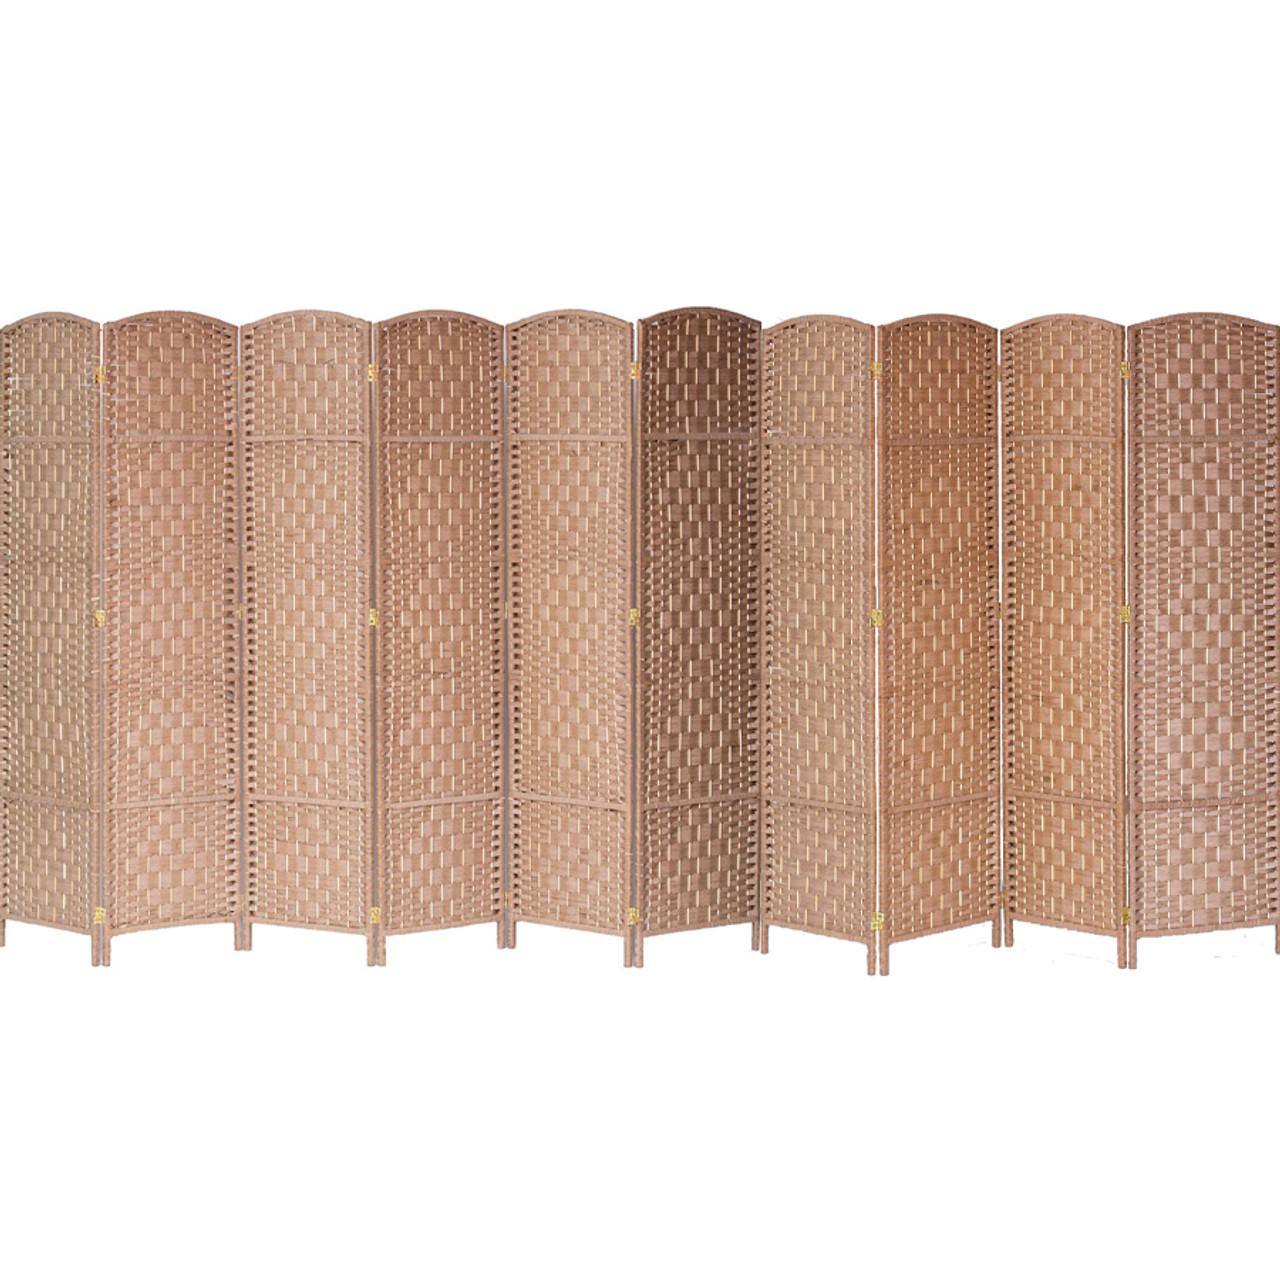 10 Panels Room Divider, Privacy Partition Screen Bamboo Woven Panel in USA, California, NY, New York City, Los Angeles, San Francisco, Pennsylvania, Washington DC, Virginia and Maryland